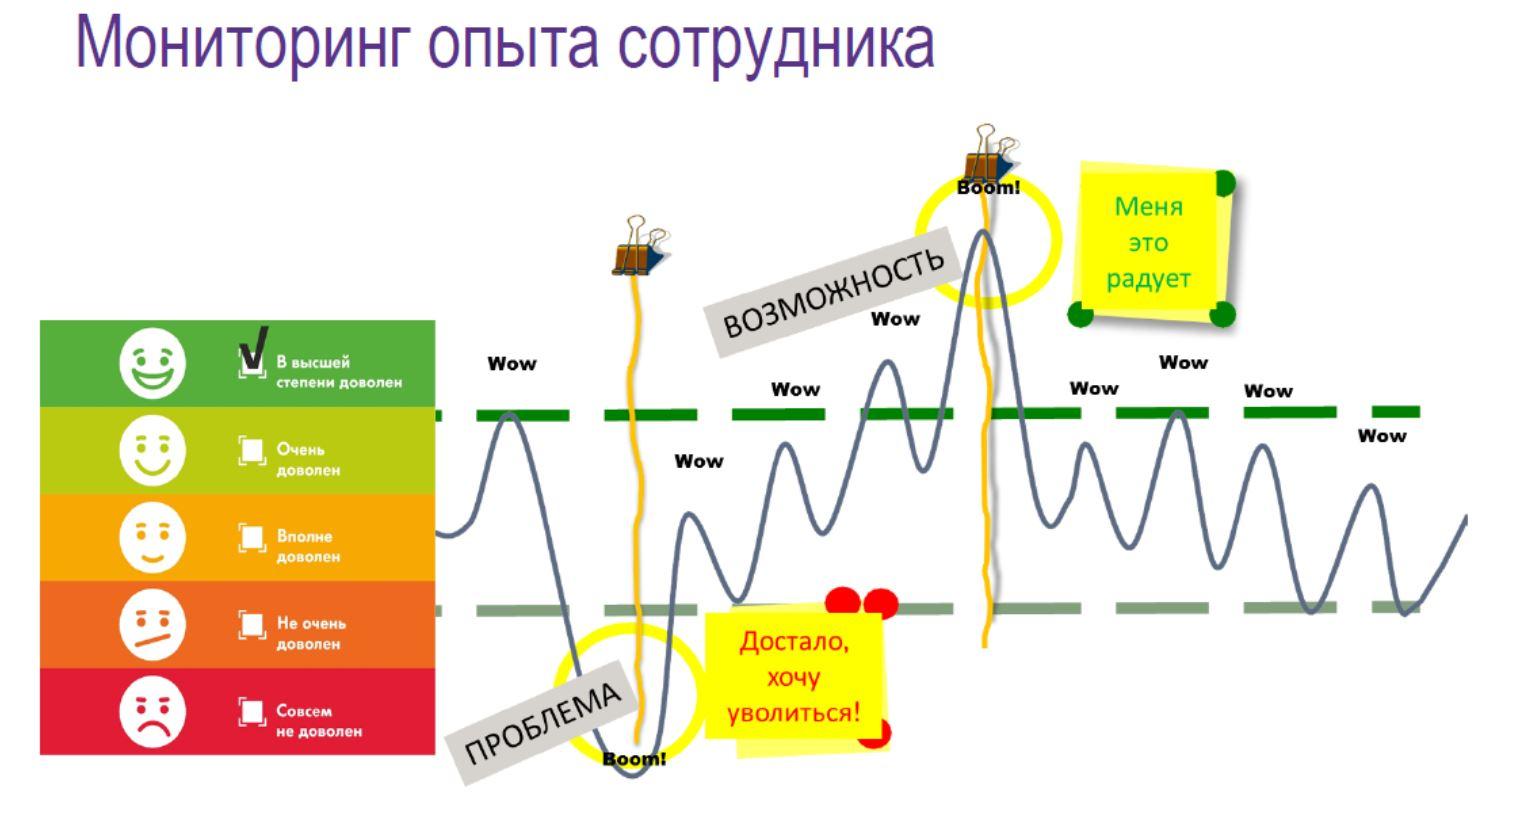 Мониторинг опыта сотрудника